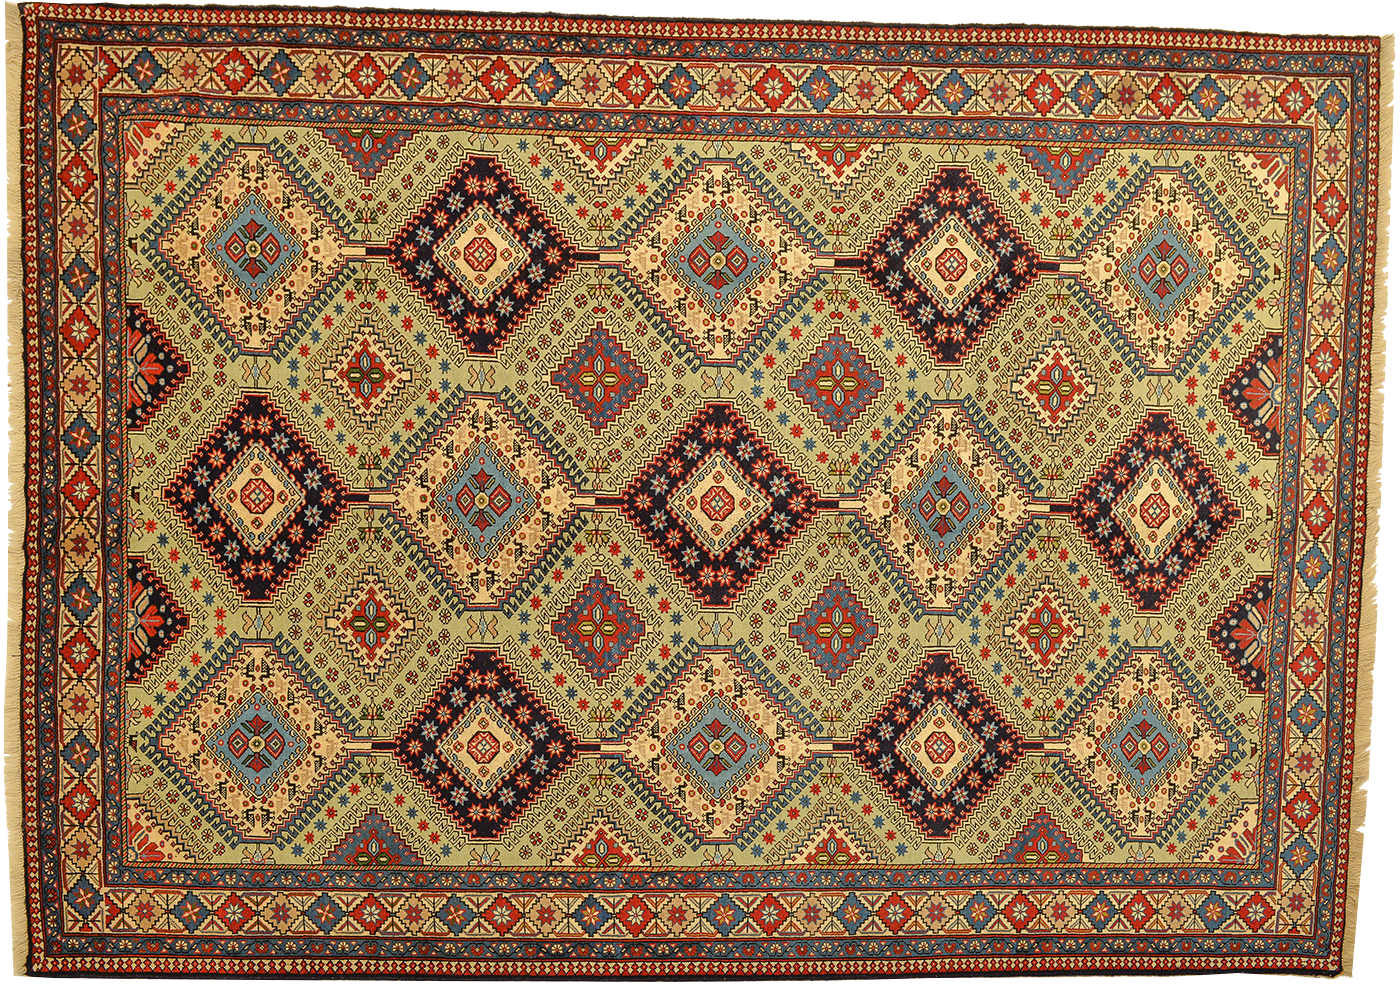 Galleria tappeti persiani orientali pompei haravi - Tappeti orientali ...